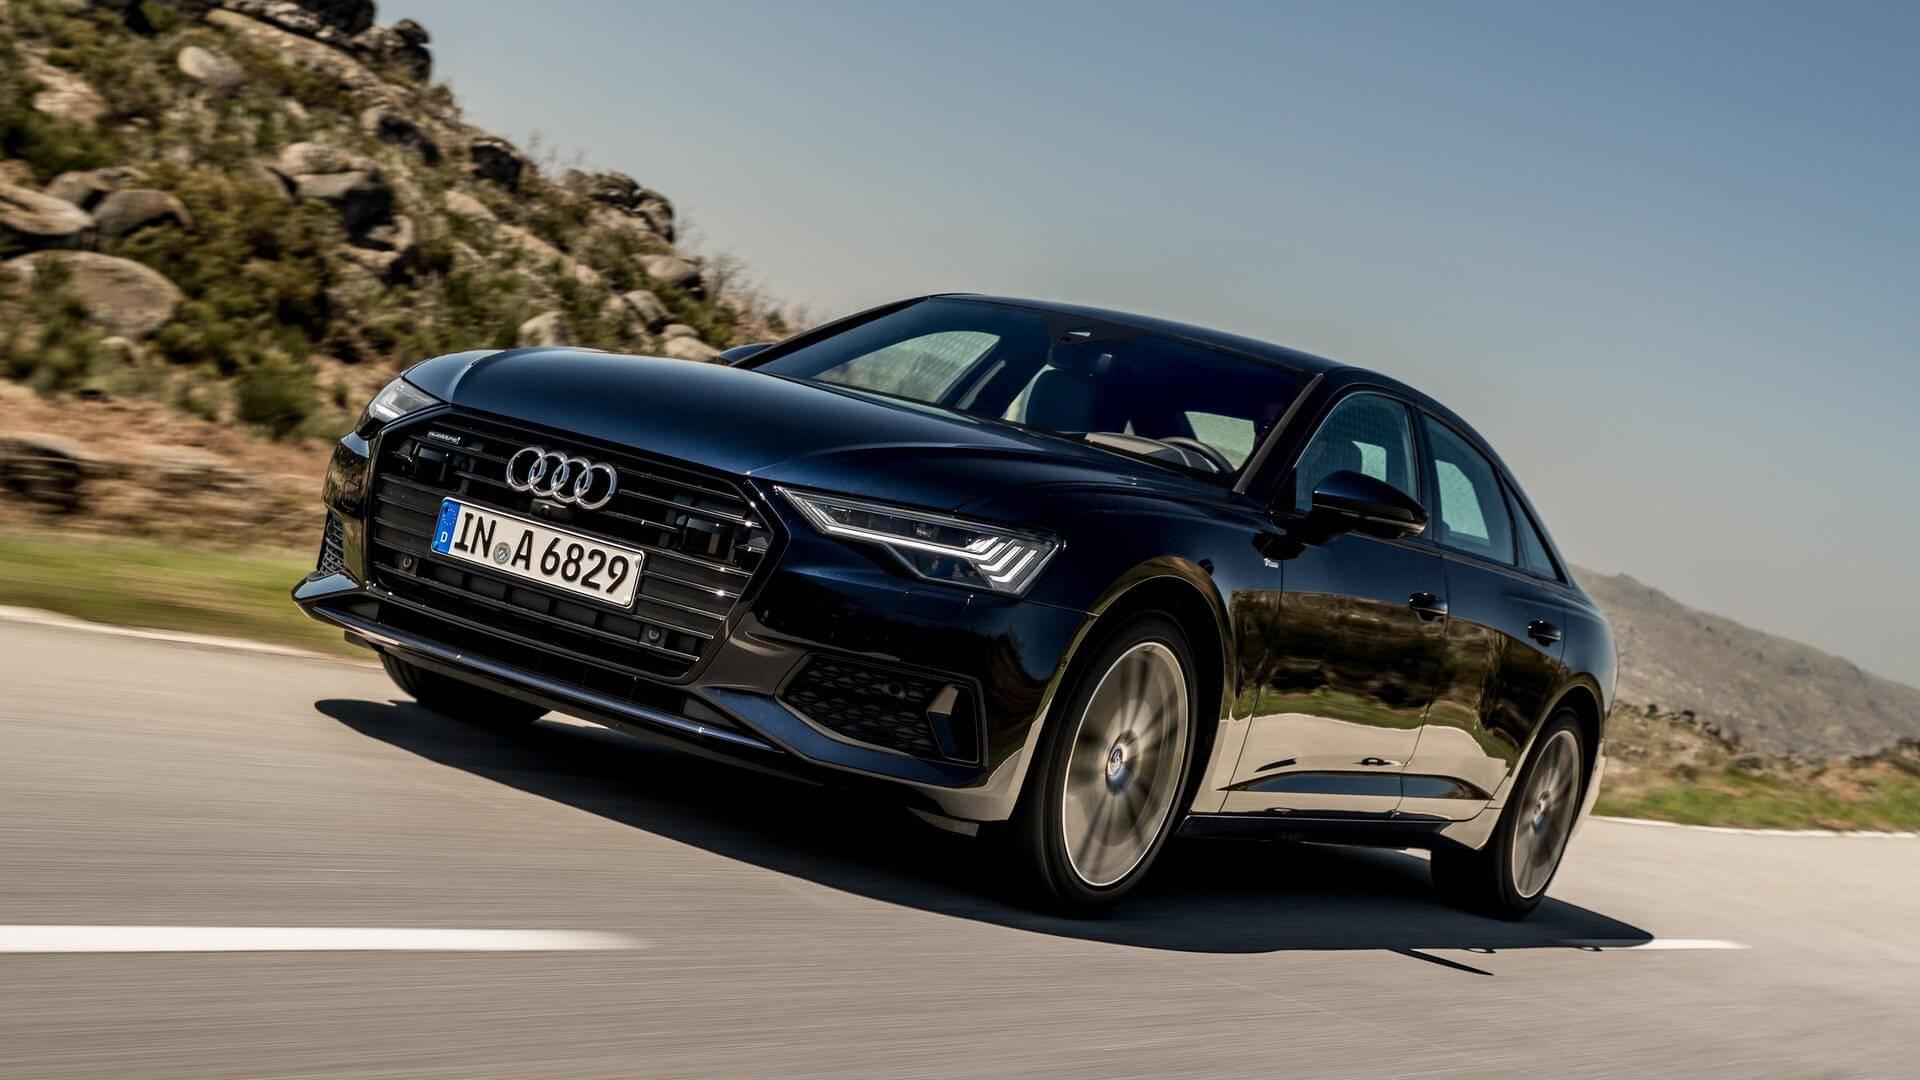 Audi-A6-C8-5.jpg